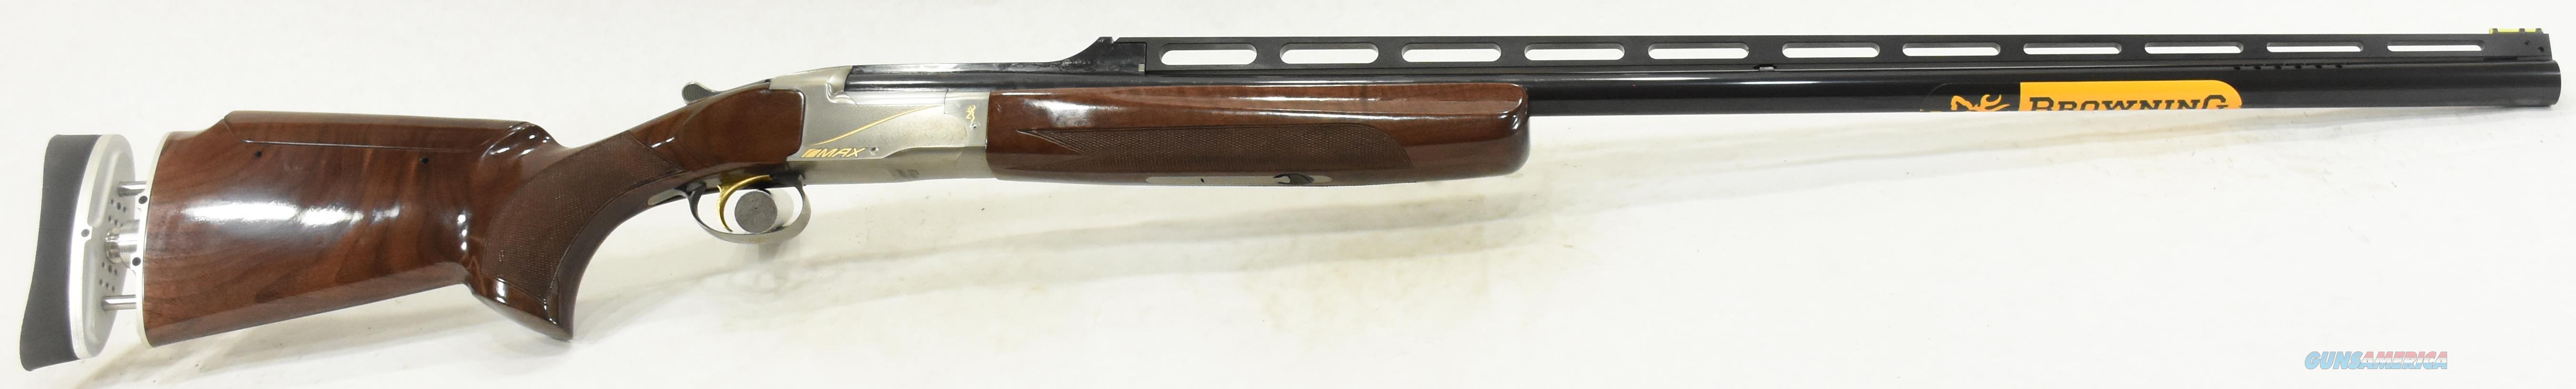 BT99 Max High Grade Adj 12Ga 34-2.75In 017087401  Guns > Shotguns > Browning Shotguns > Over Unders > Other OU > Trap/Skeet